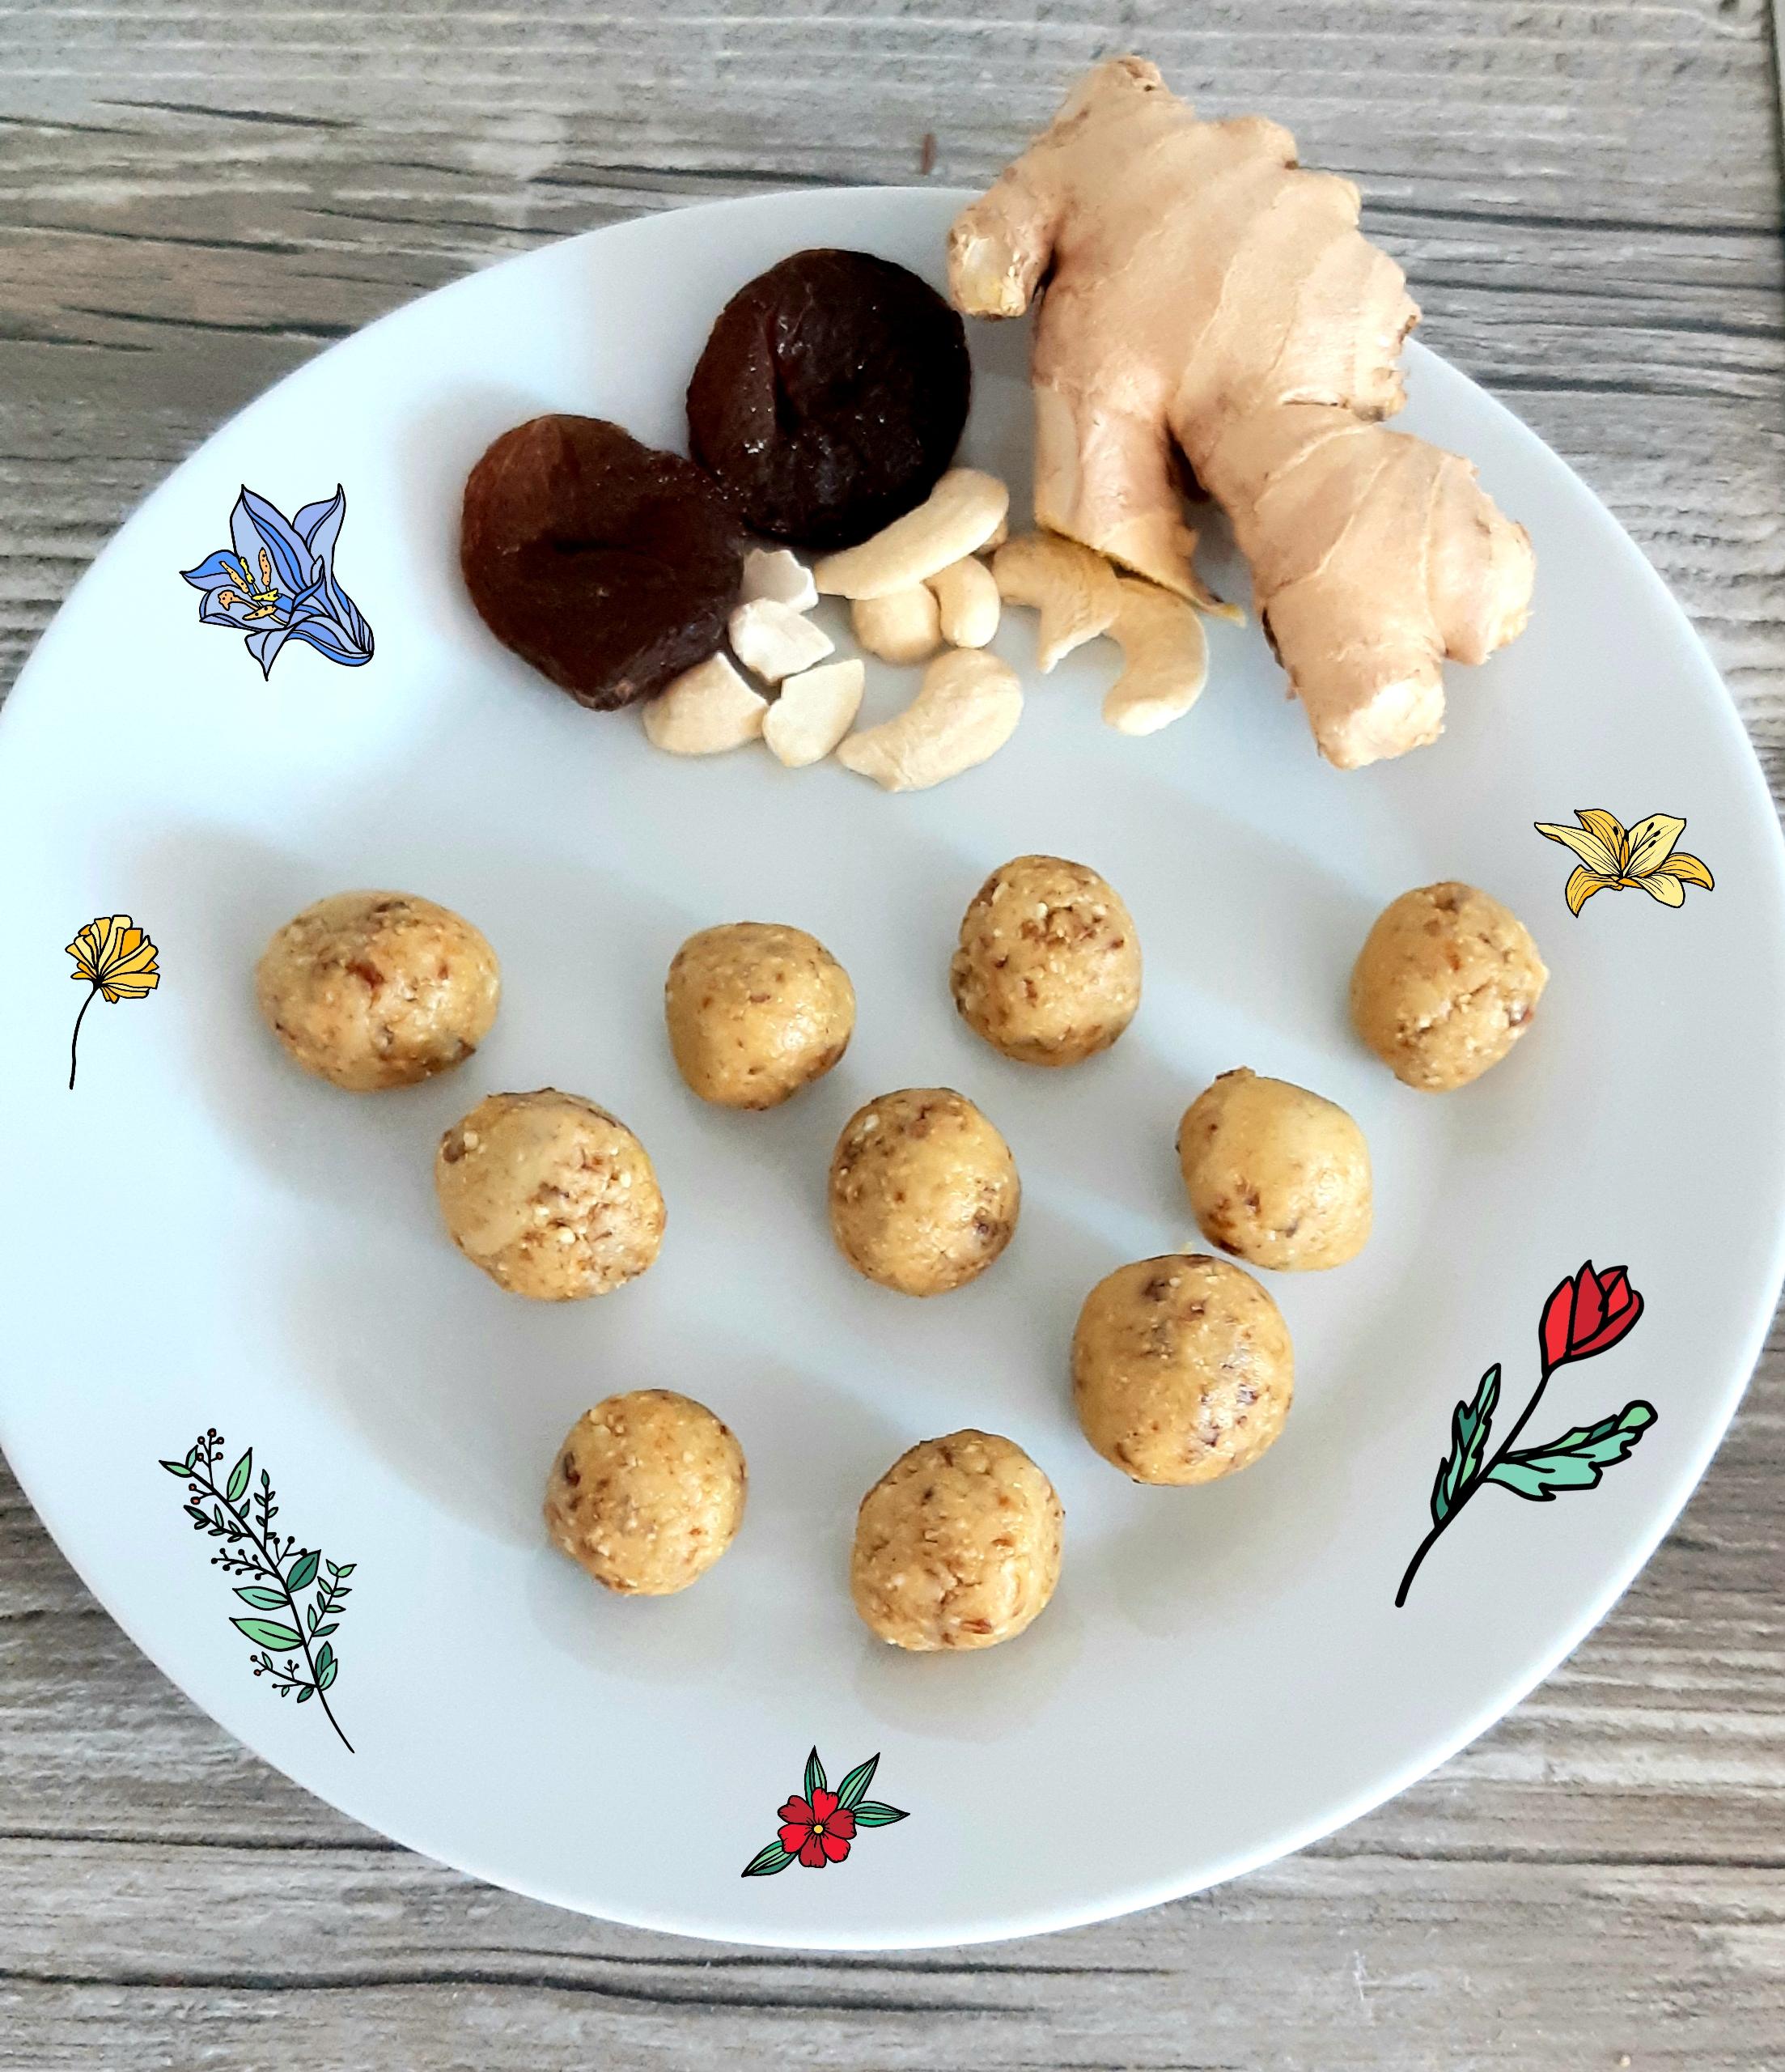 Cashew-Trockenaprikose-Nascherei